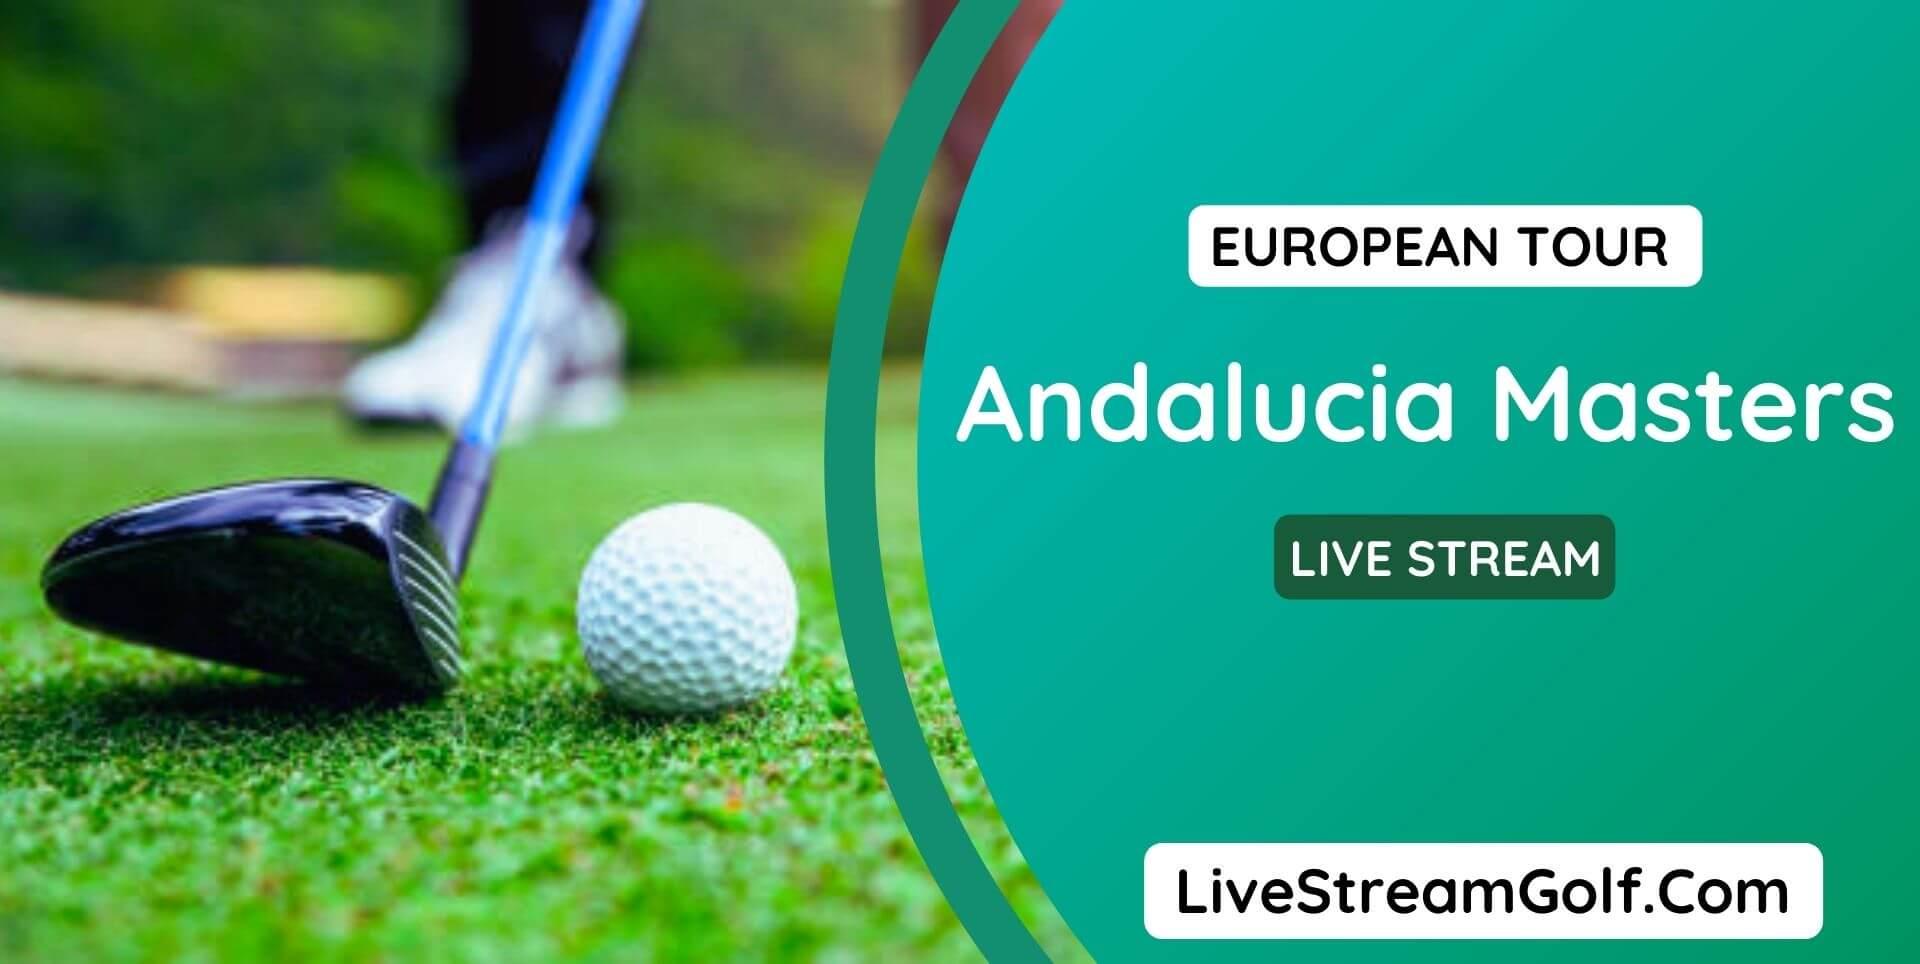 Andalucia Masters Live Stream